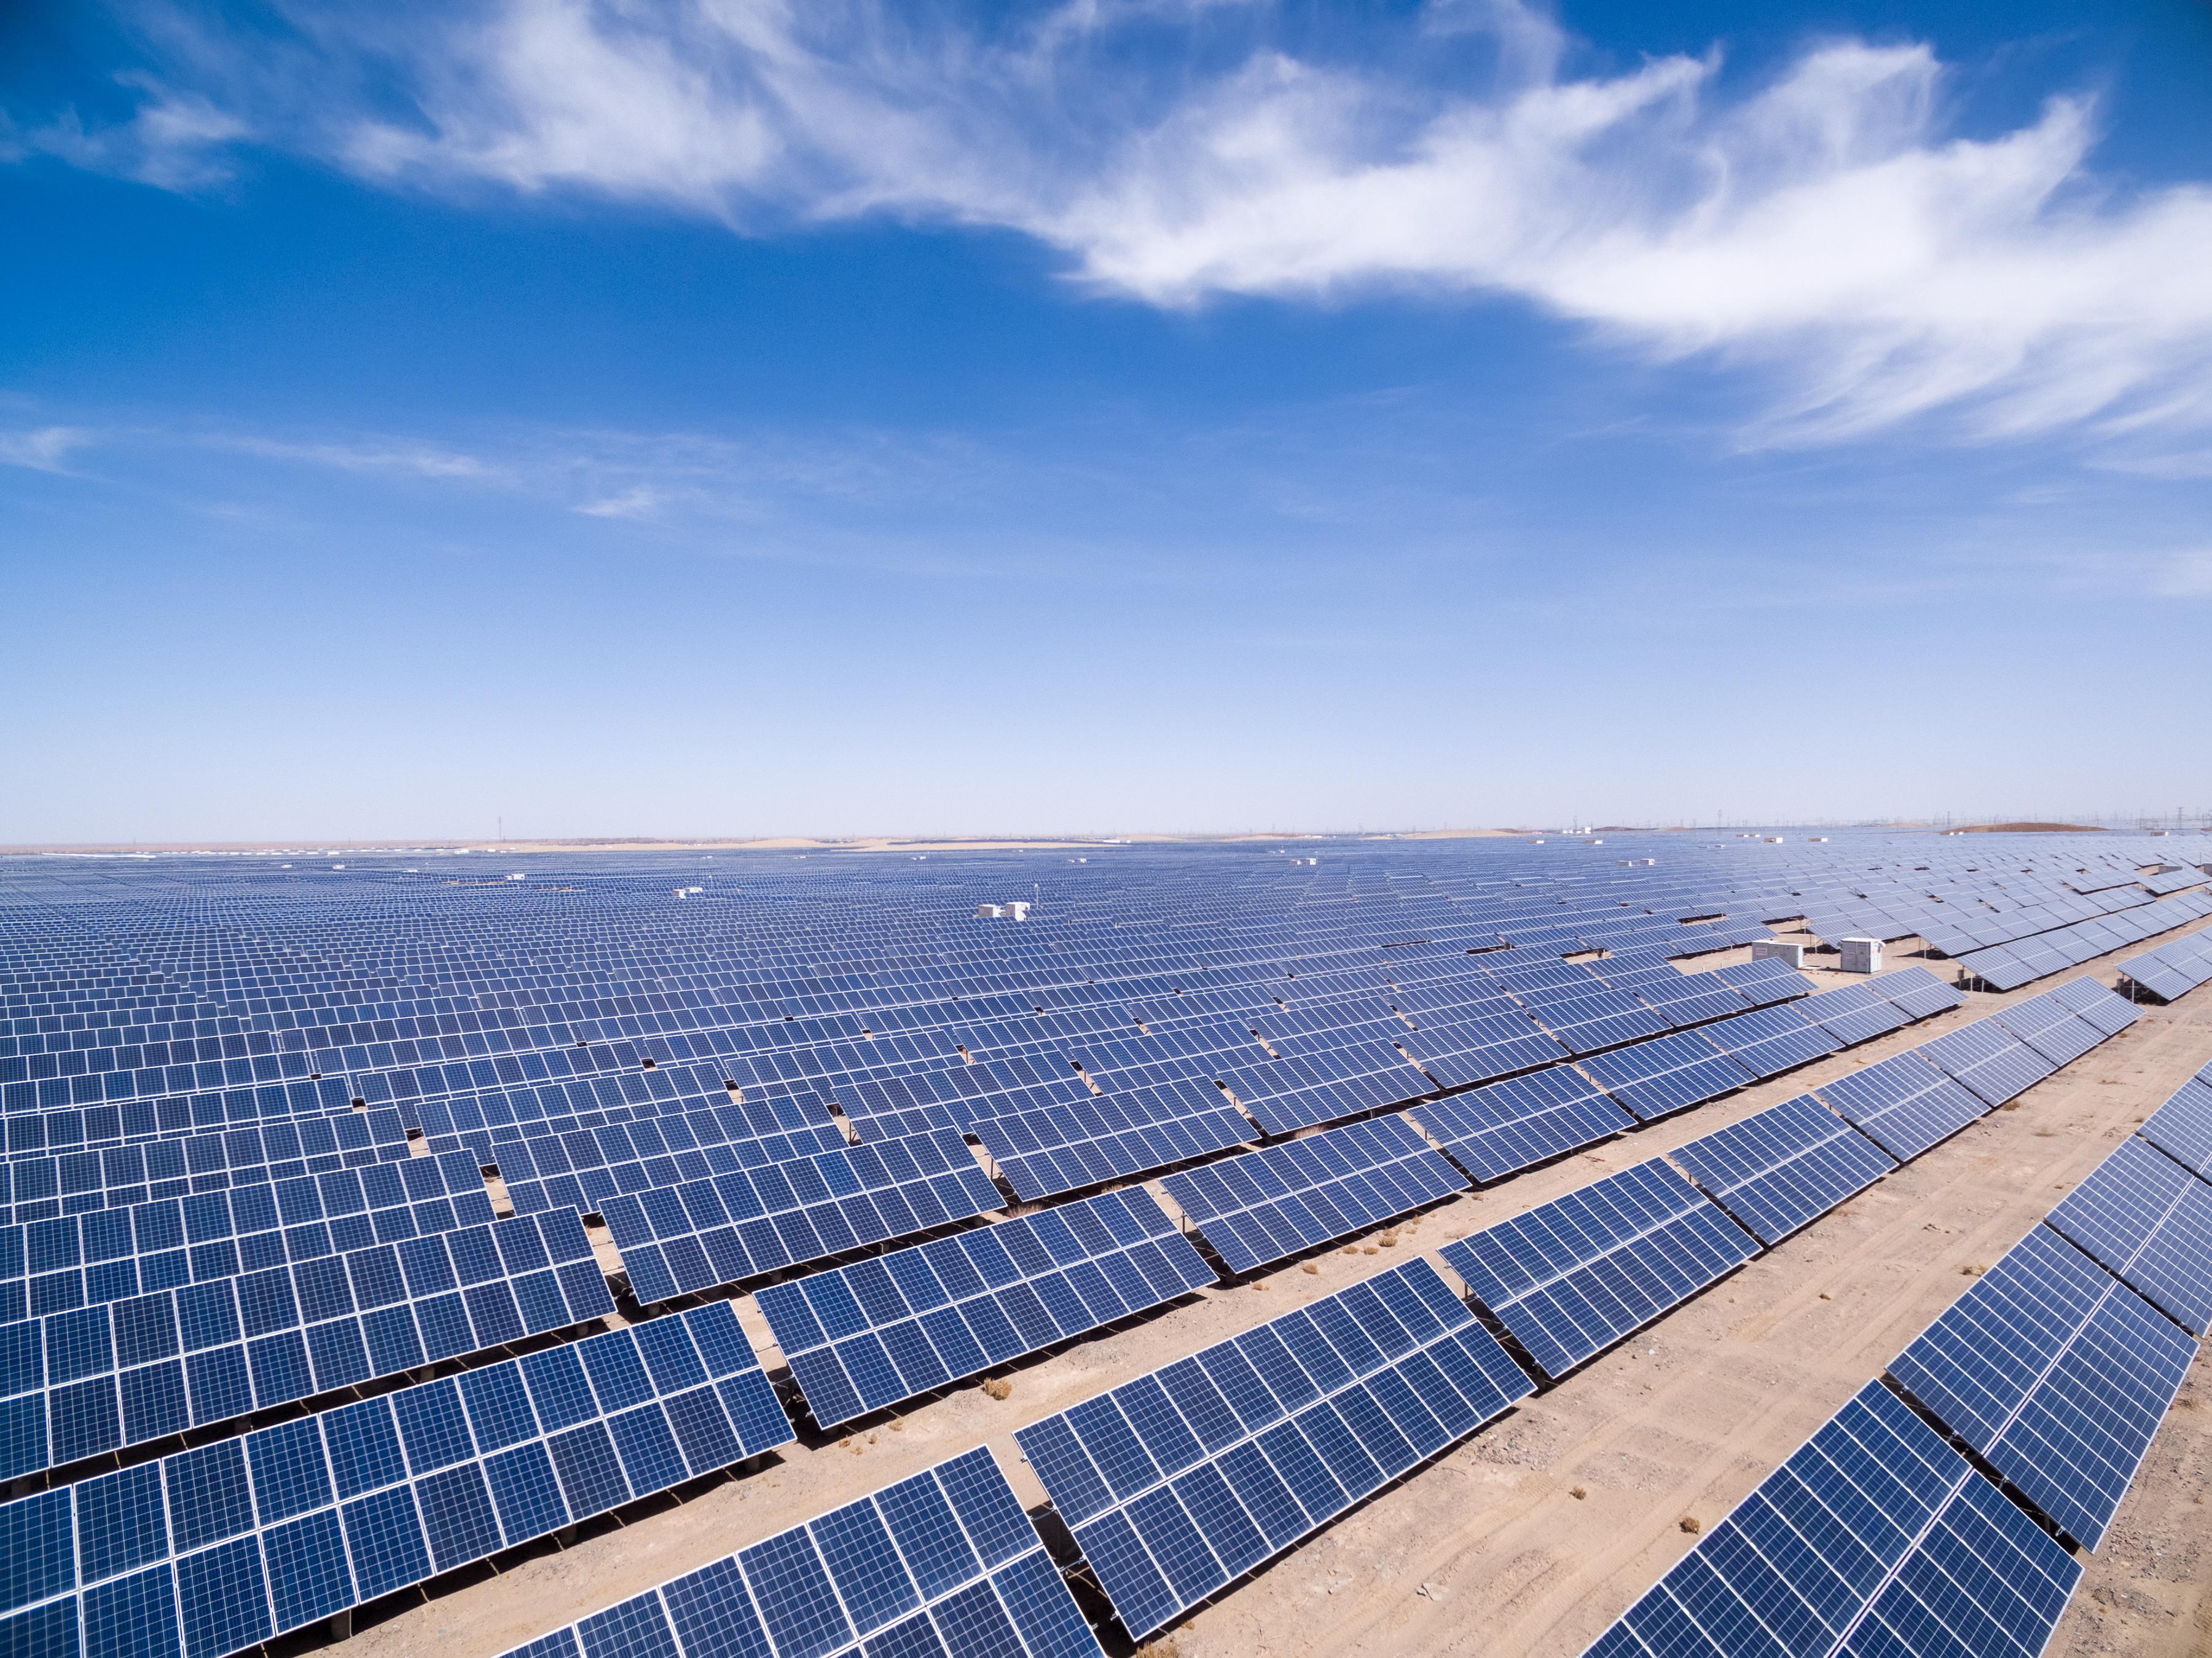 Solar Energy Has Record Start to 2019